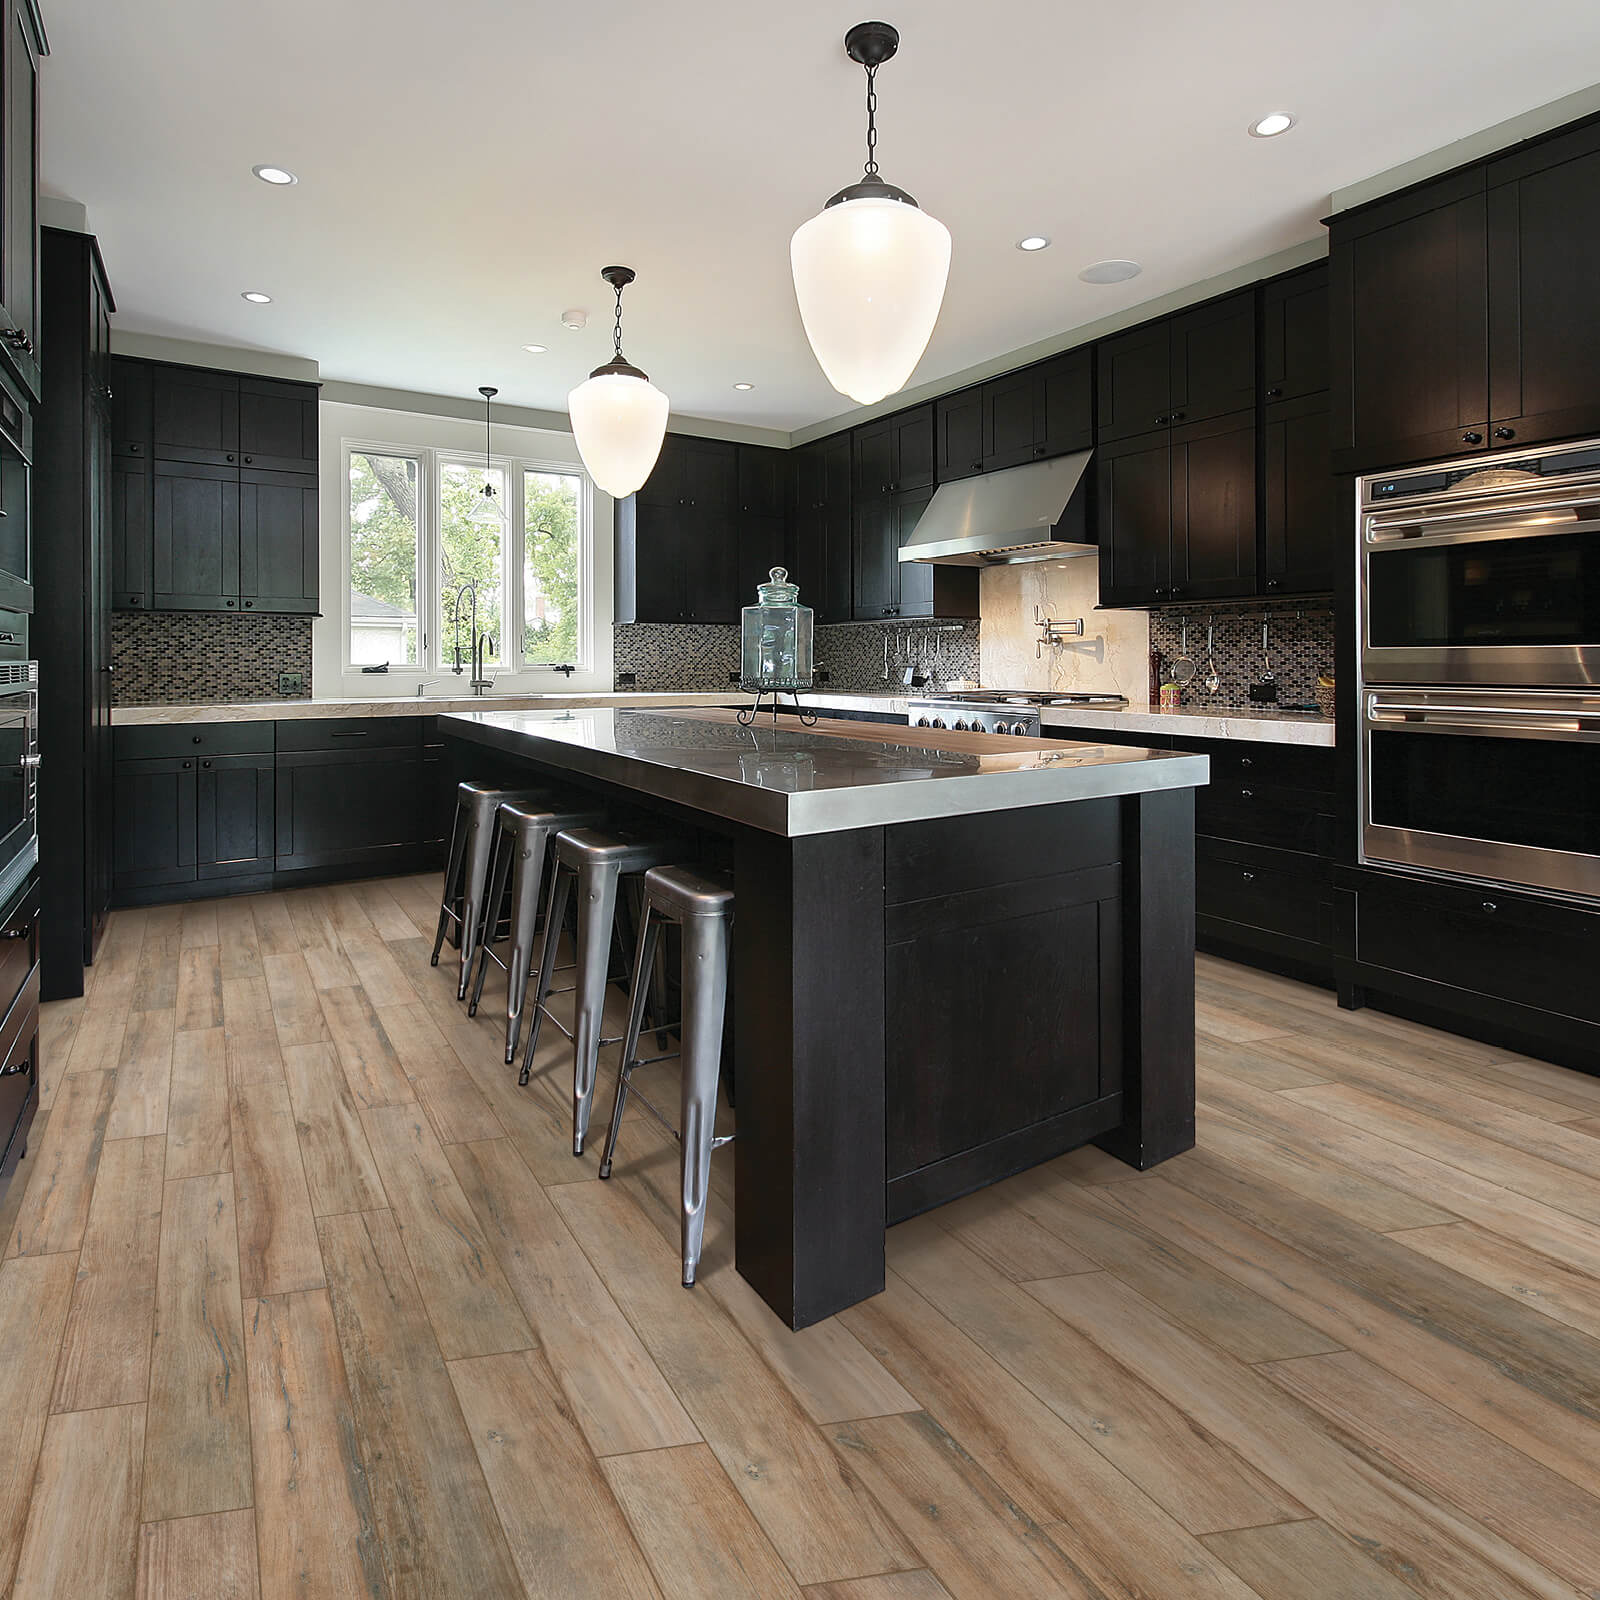 Magnolia Bend Natural Driftwood | Dolphin Carpet & Tile